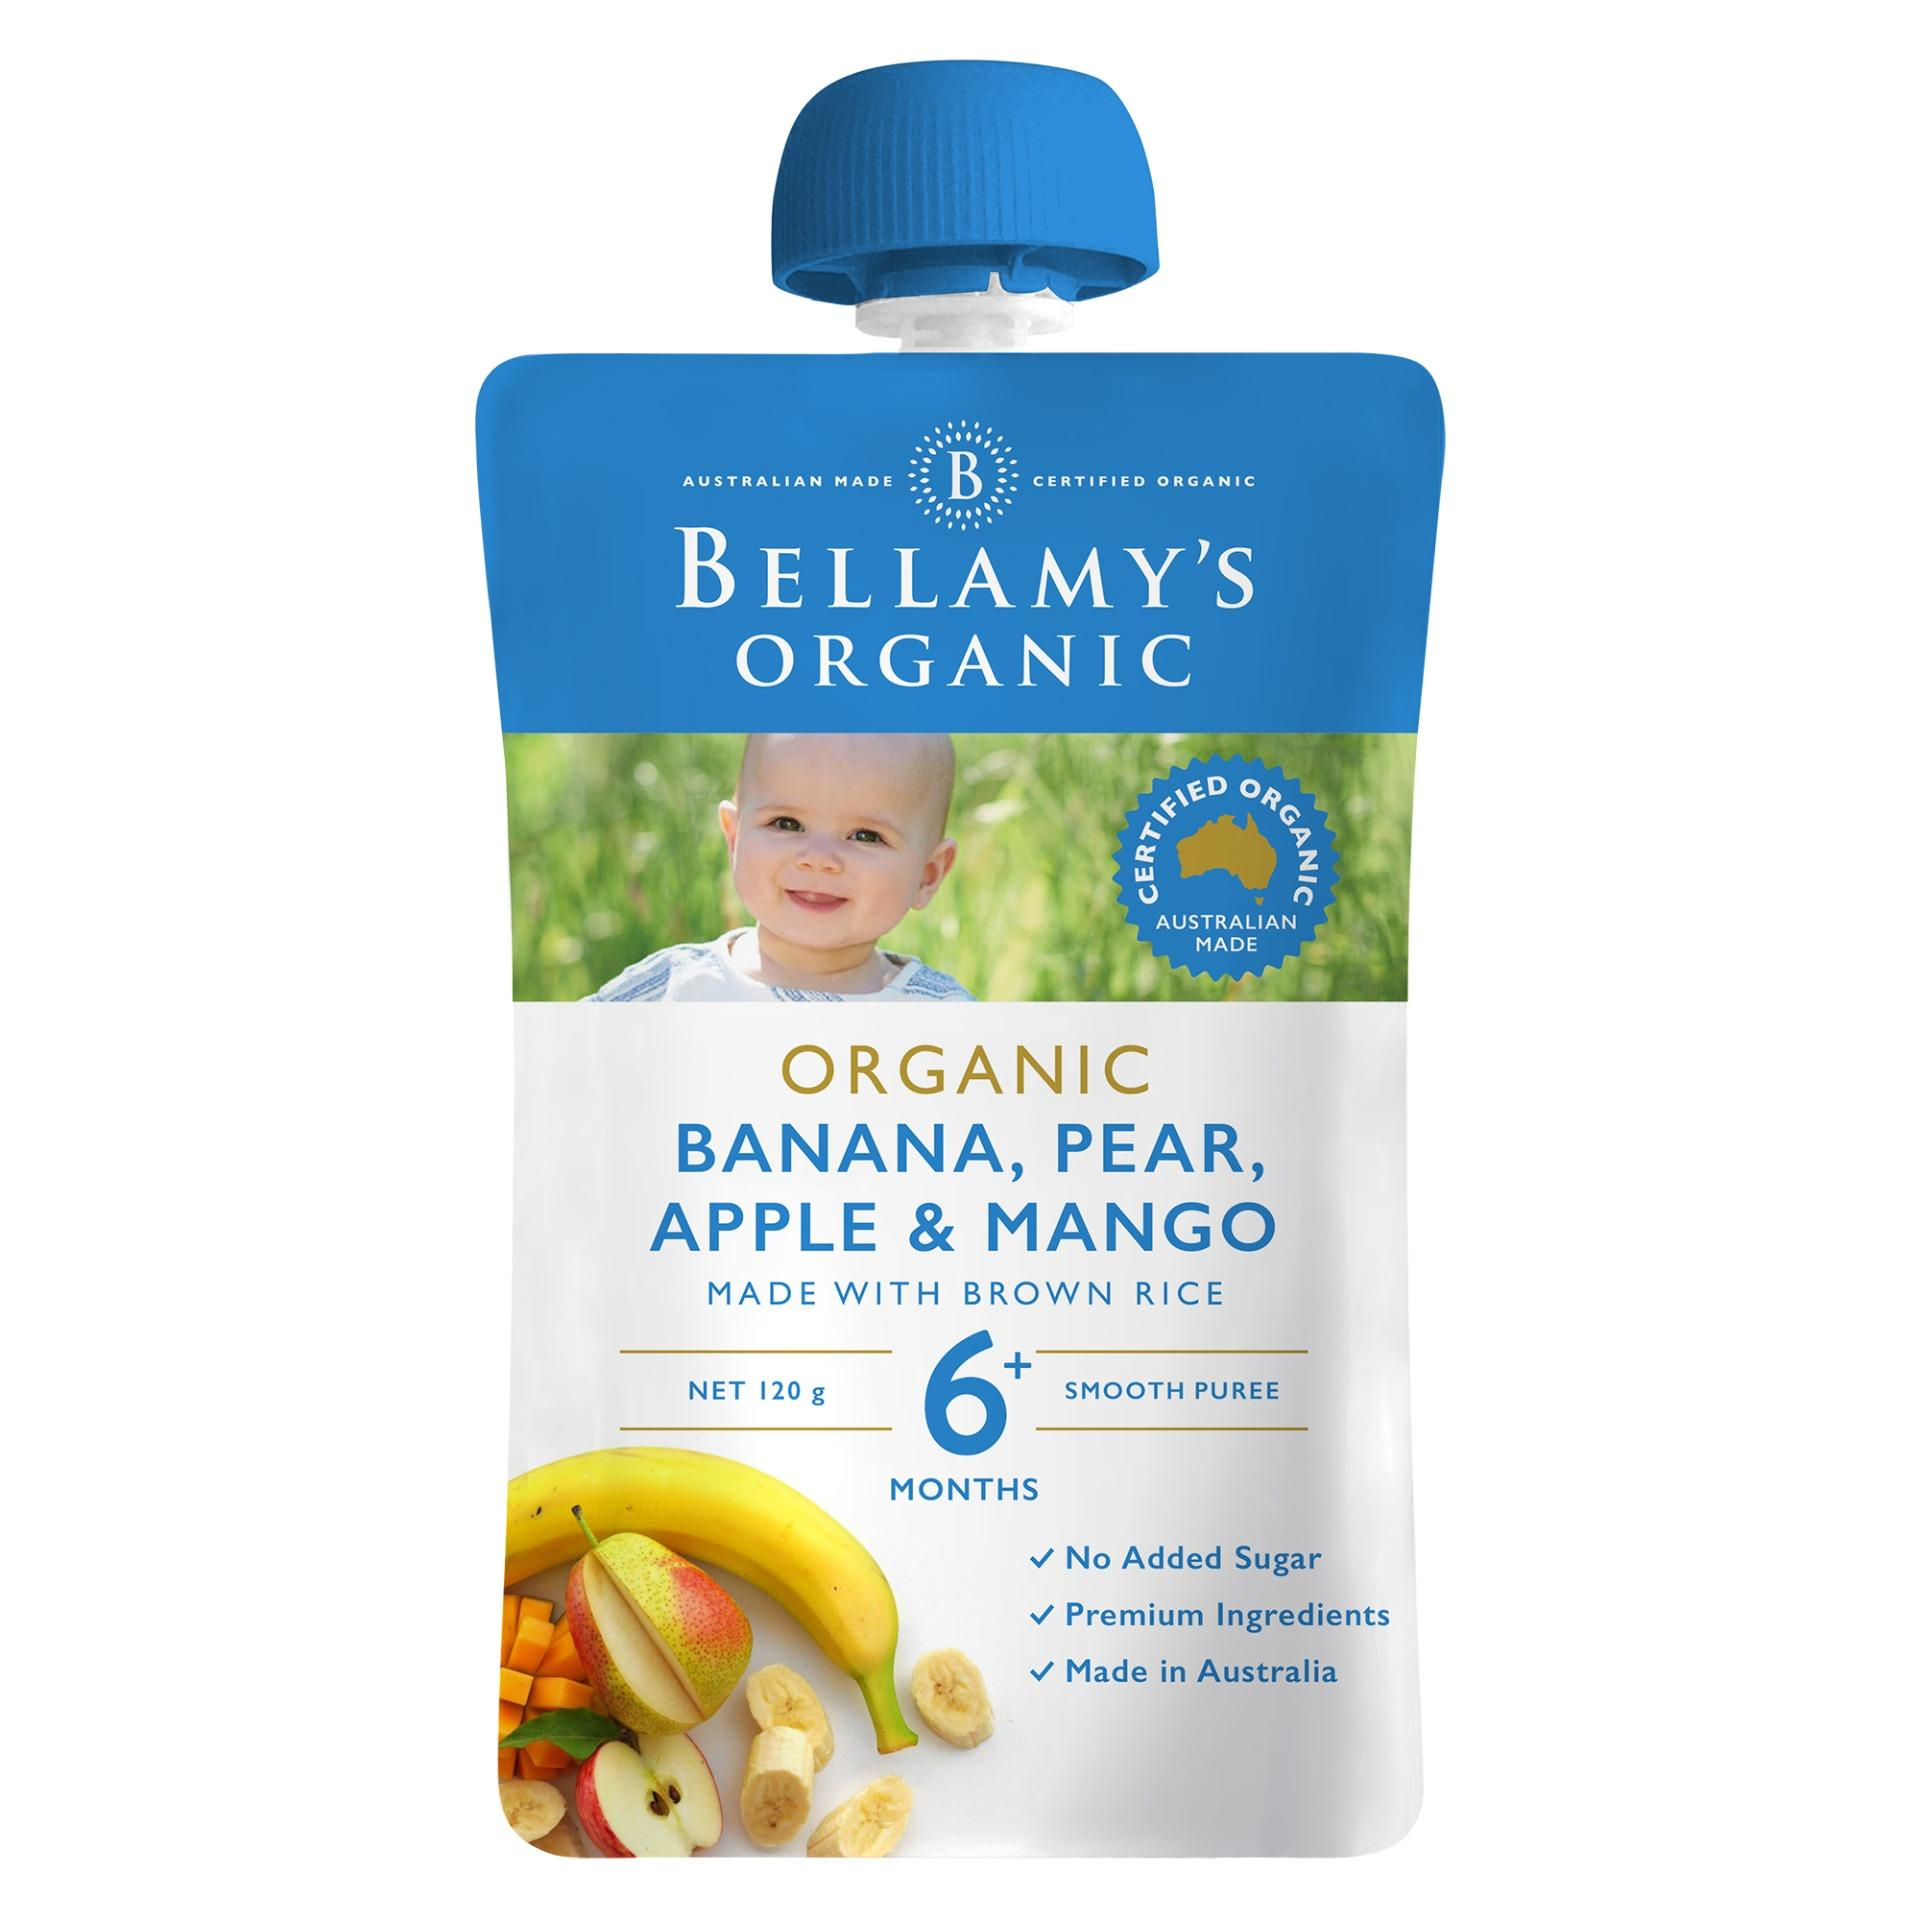 Bellamys Organic Banana, Pear, Apple & Mango By Lazada Retail Bellamys Organic.